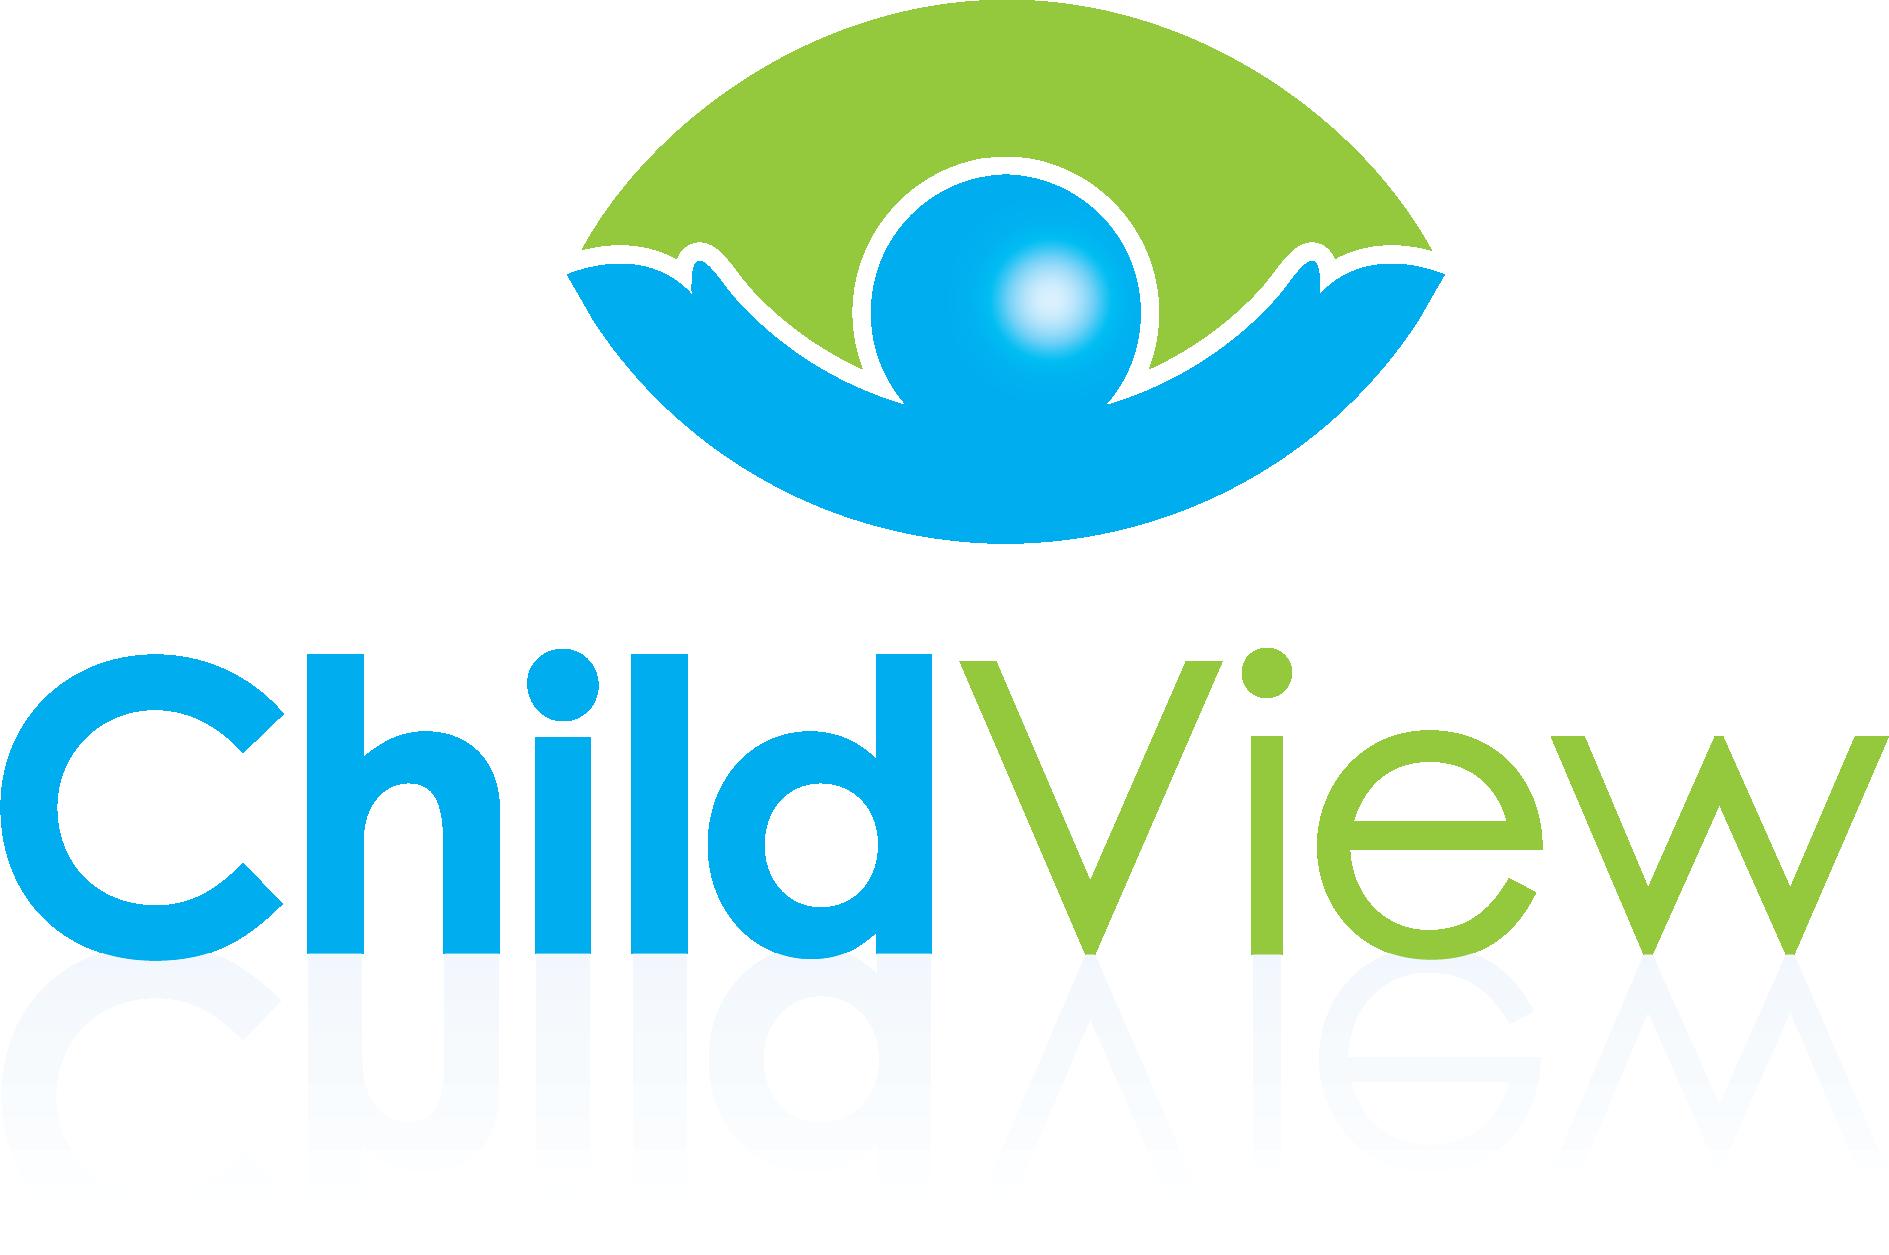 ChildView logo by Studio 9017